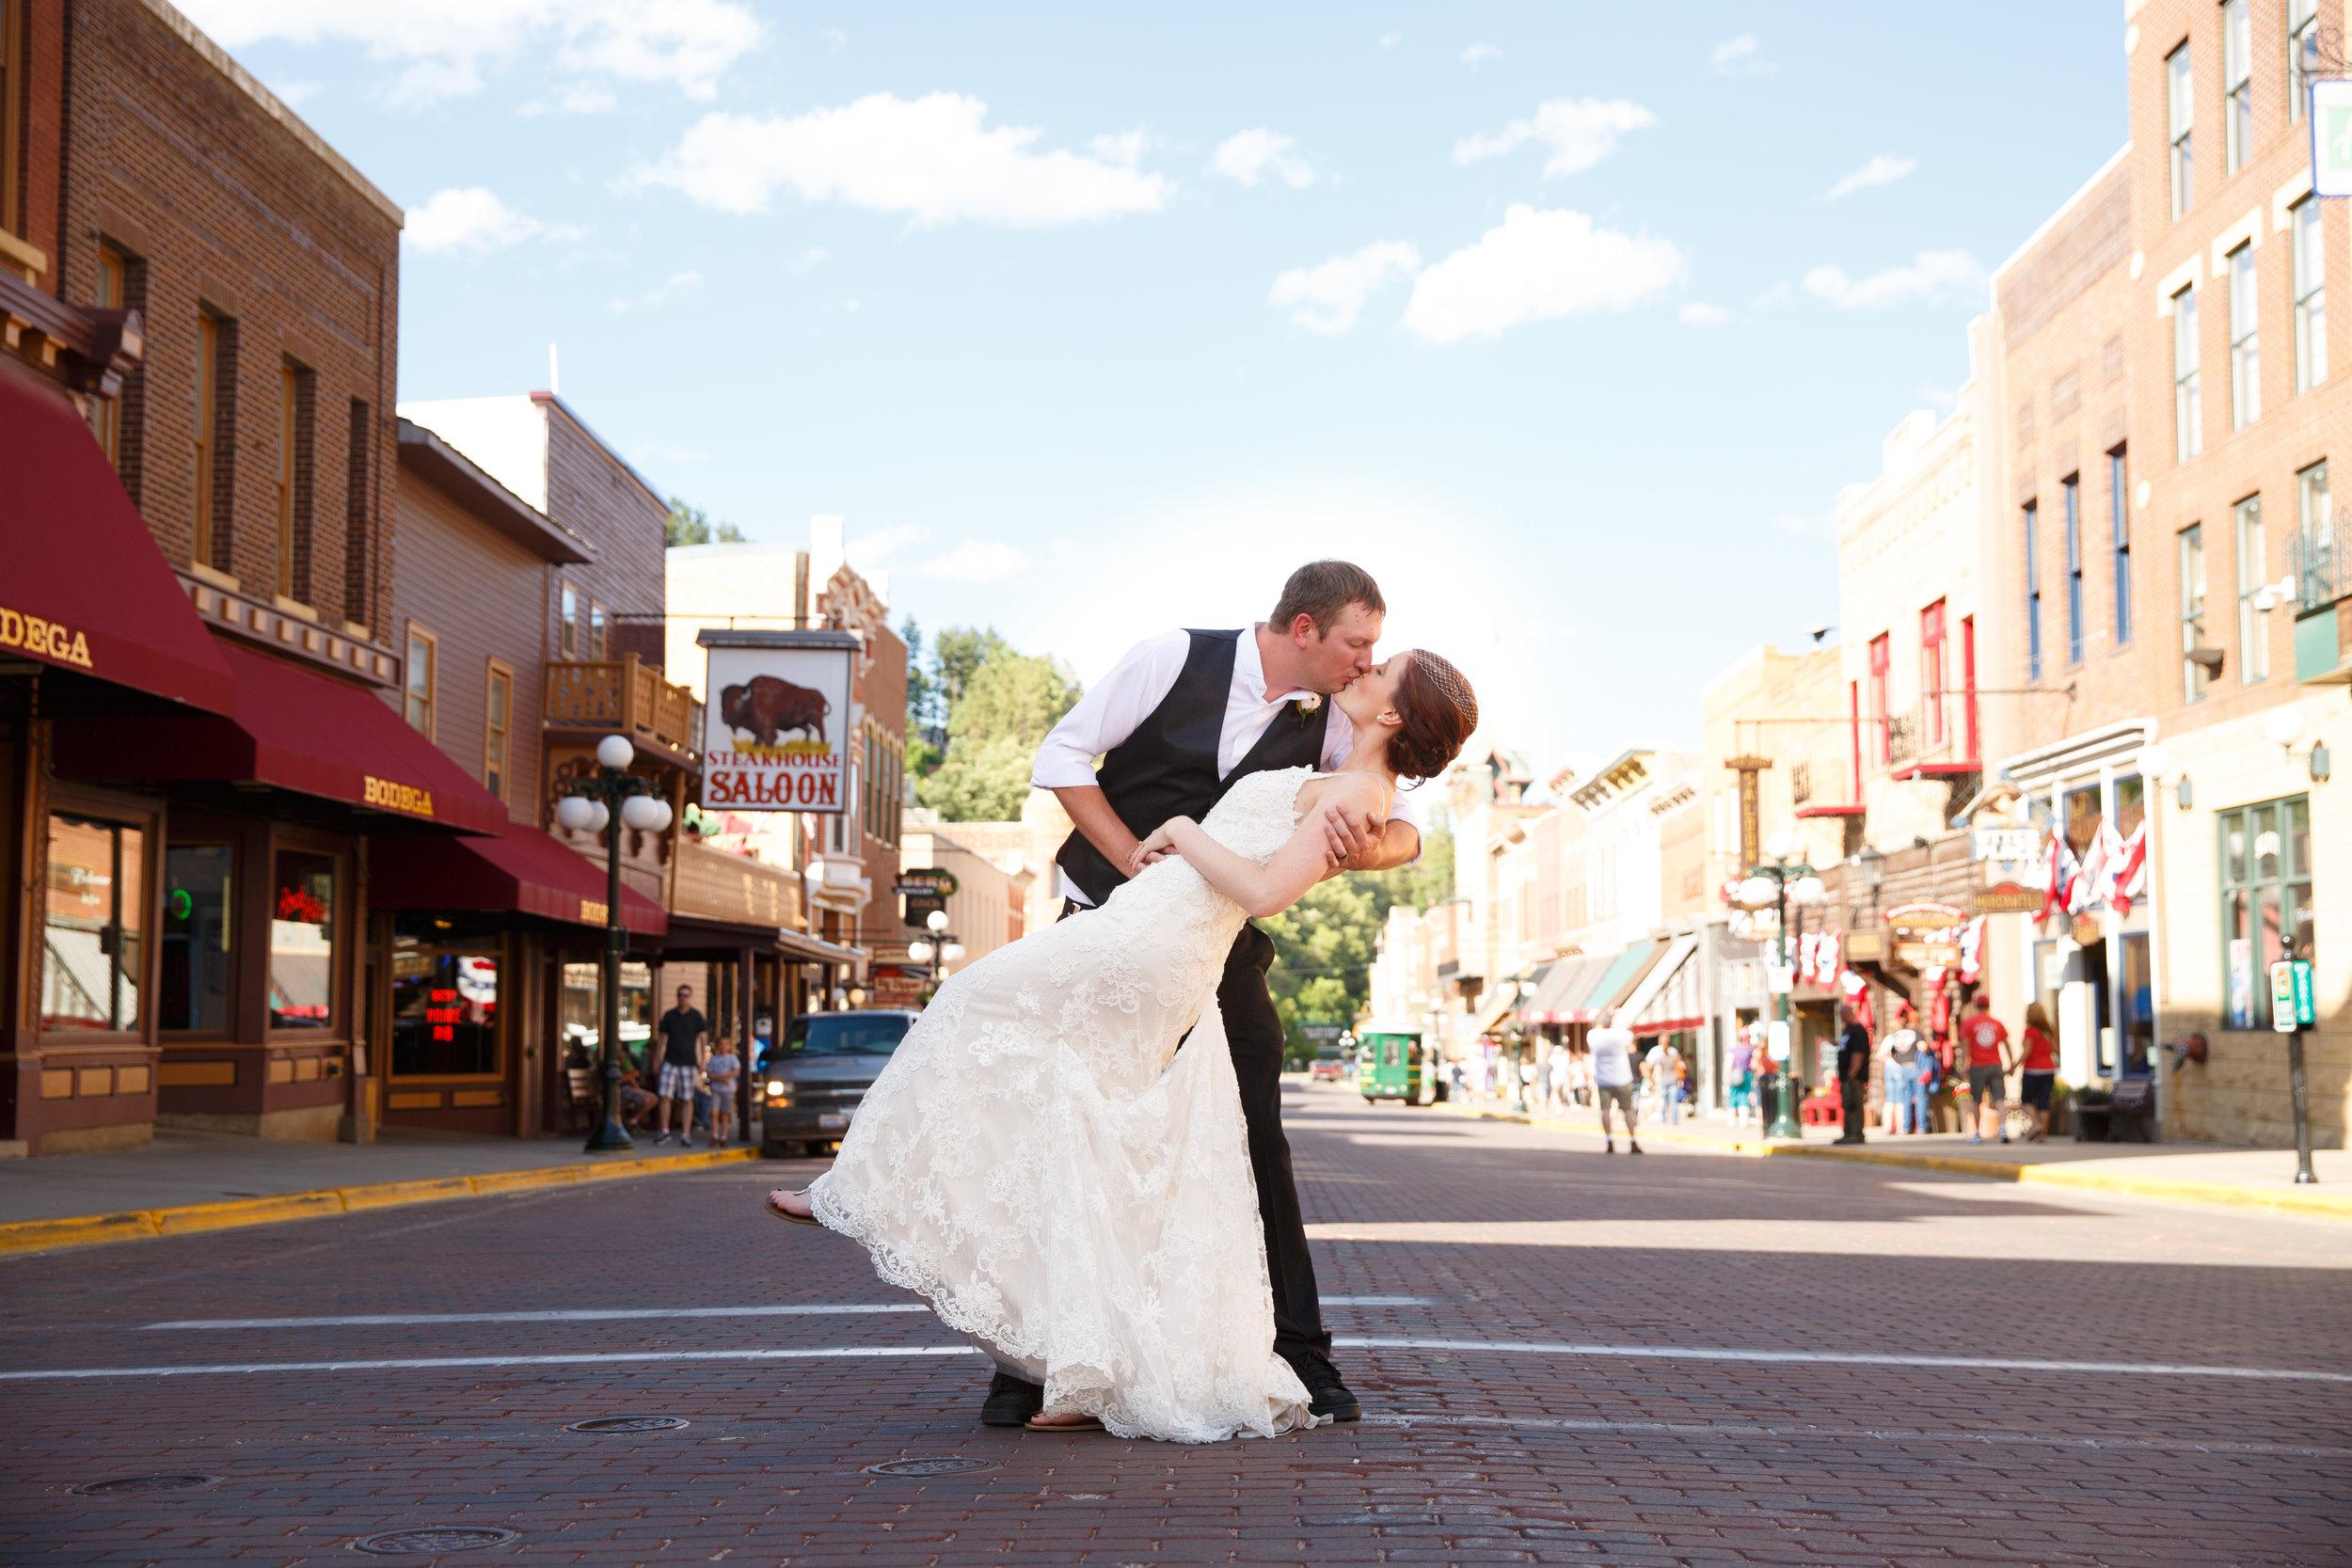 Main Street - Deadwood, SD